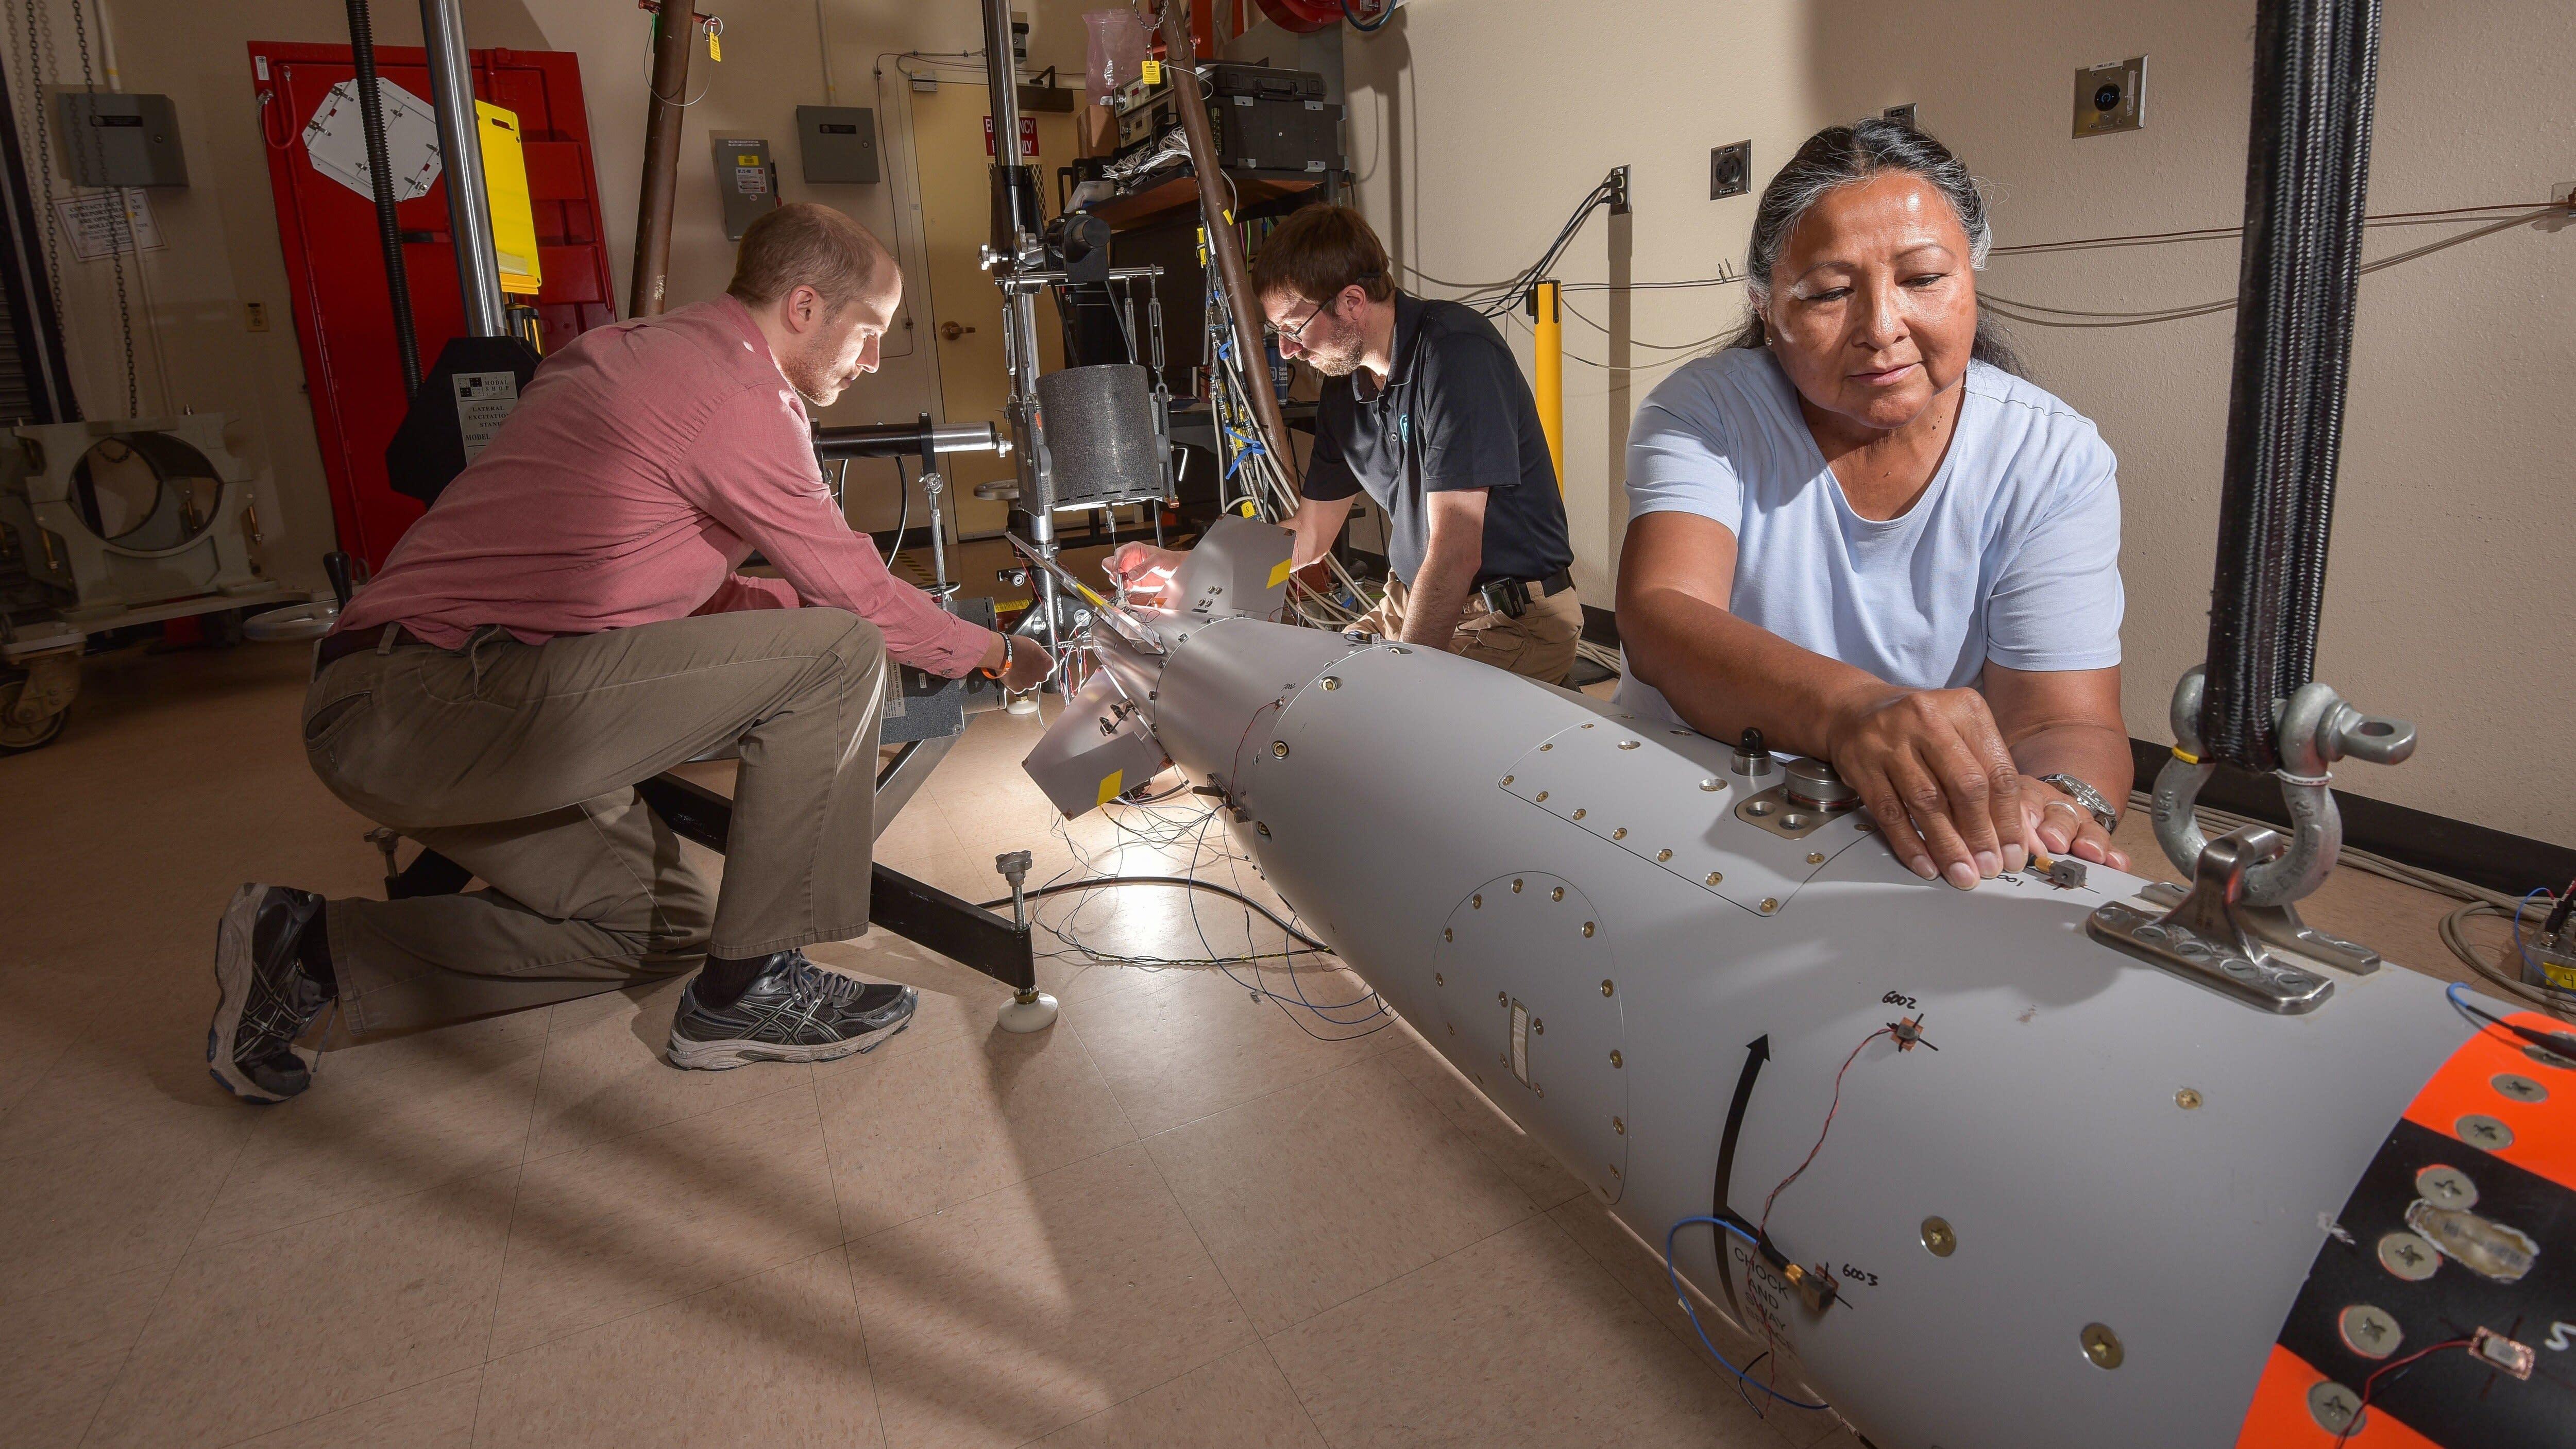 Nuclear official says warhead modernization program on track despite COVID, GAO concerns